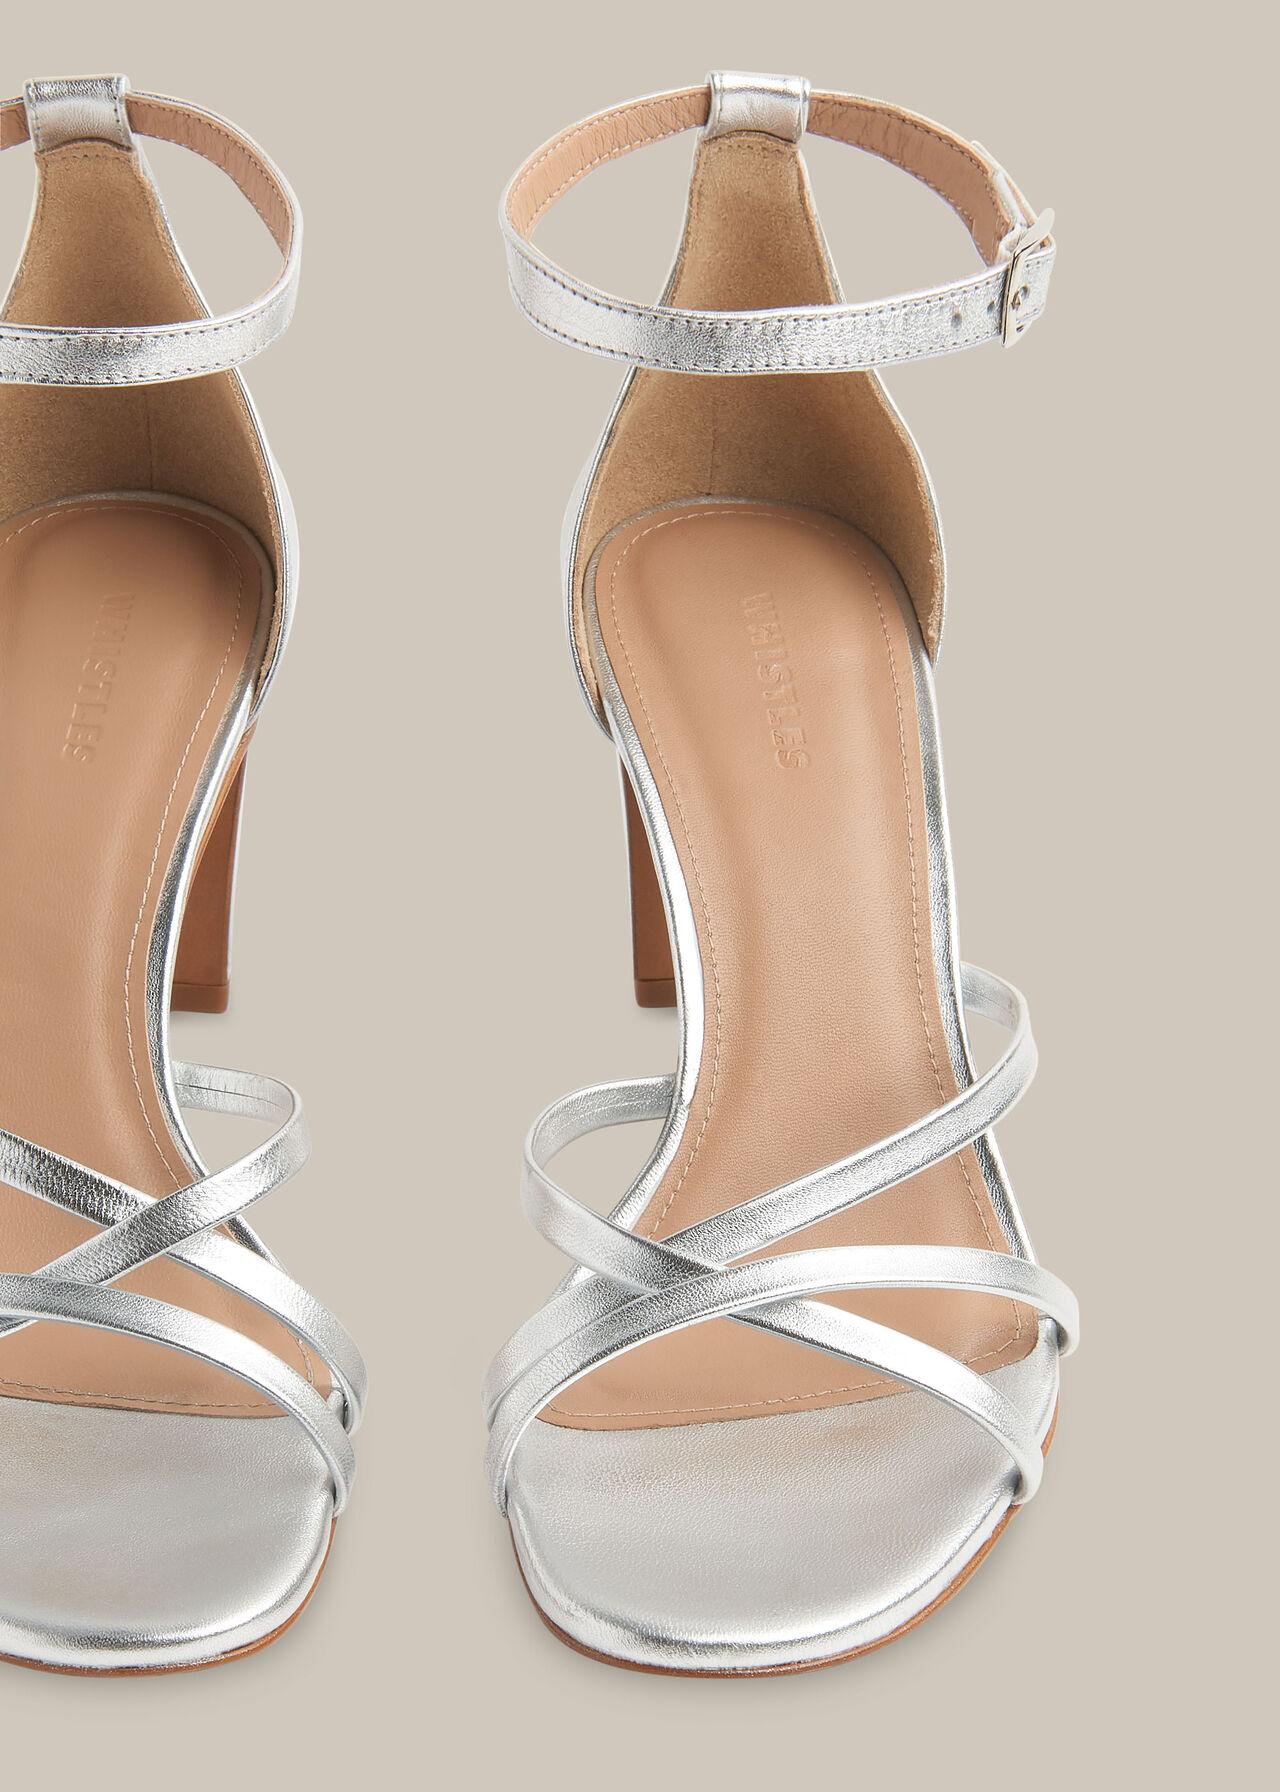 Hallie Strappy High Sandal